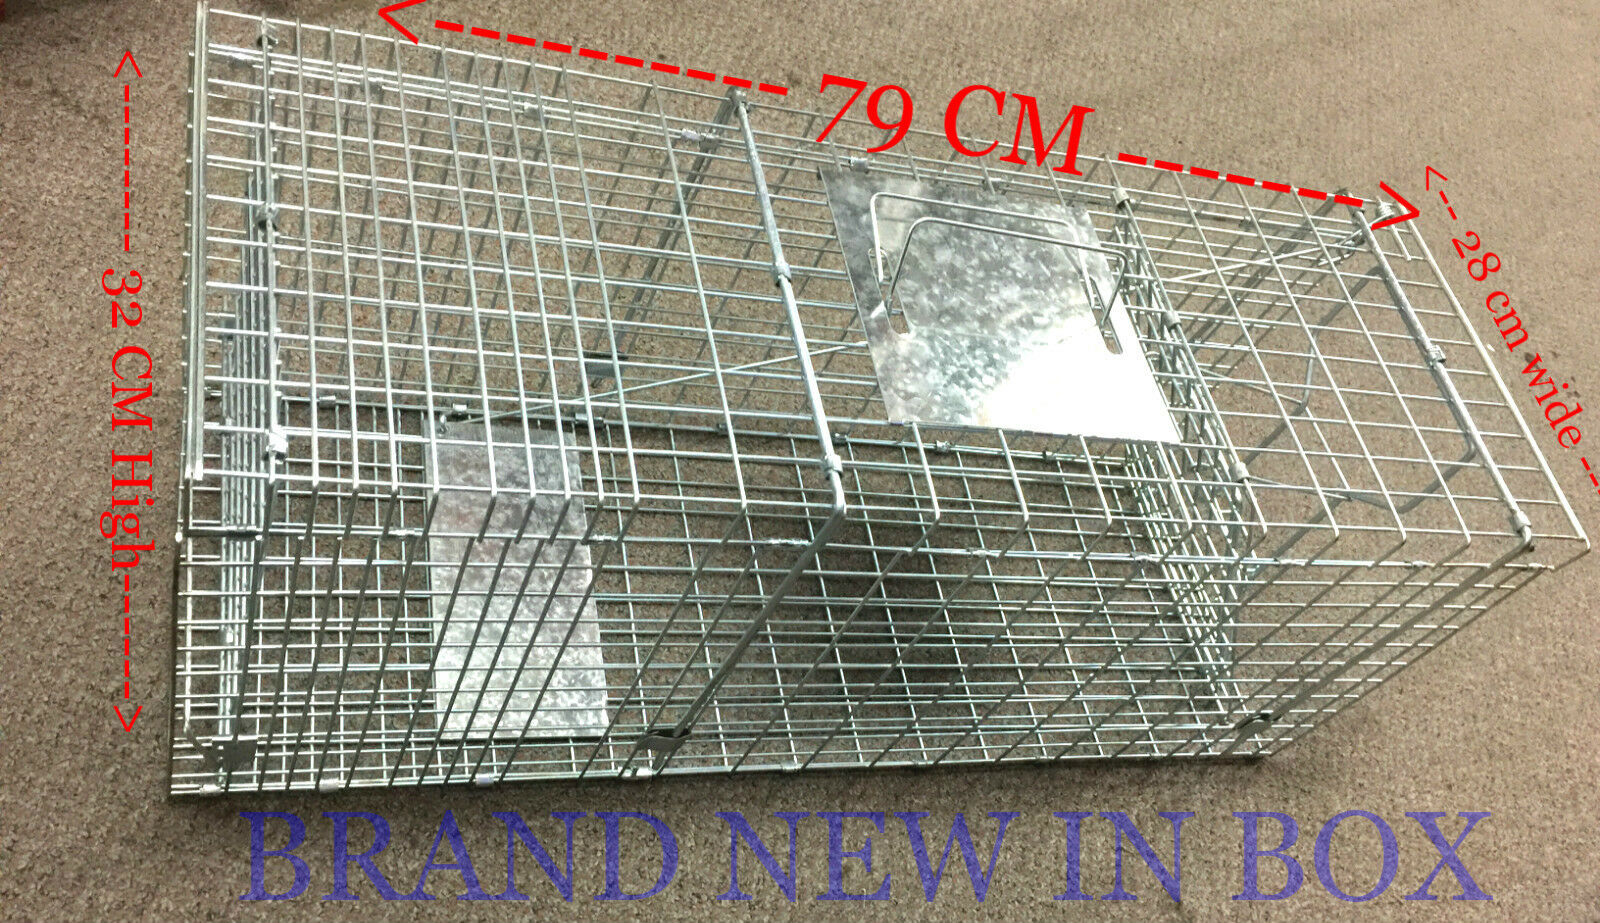 Extra Grande Jaula Trampa Humana Possum captura animales vivos Gato Conejo Ave Cebo Rata